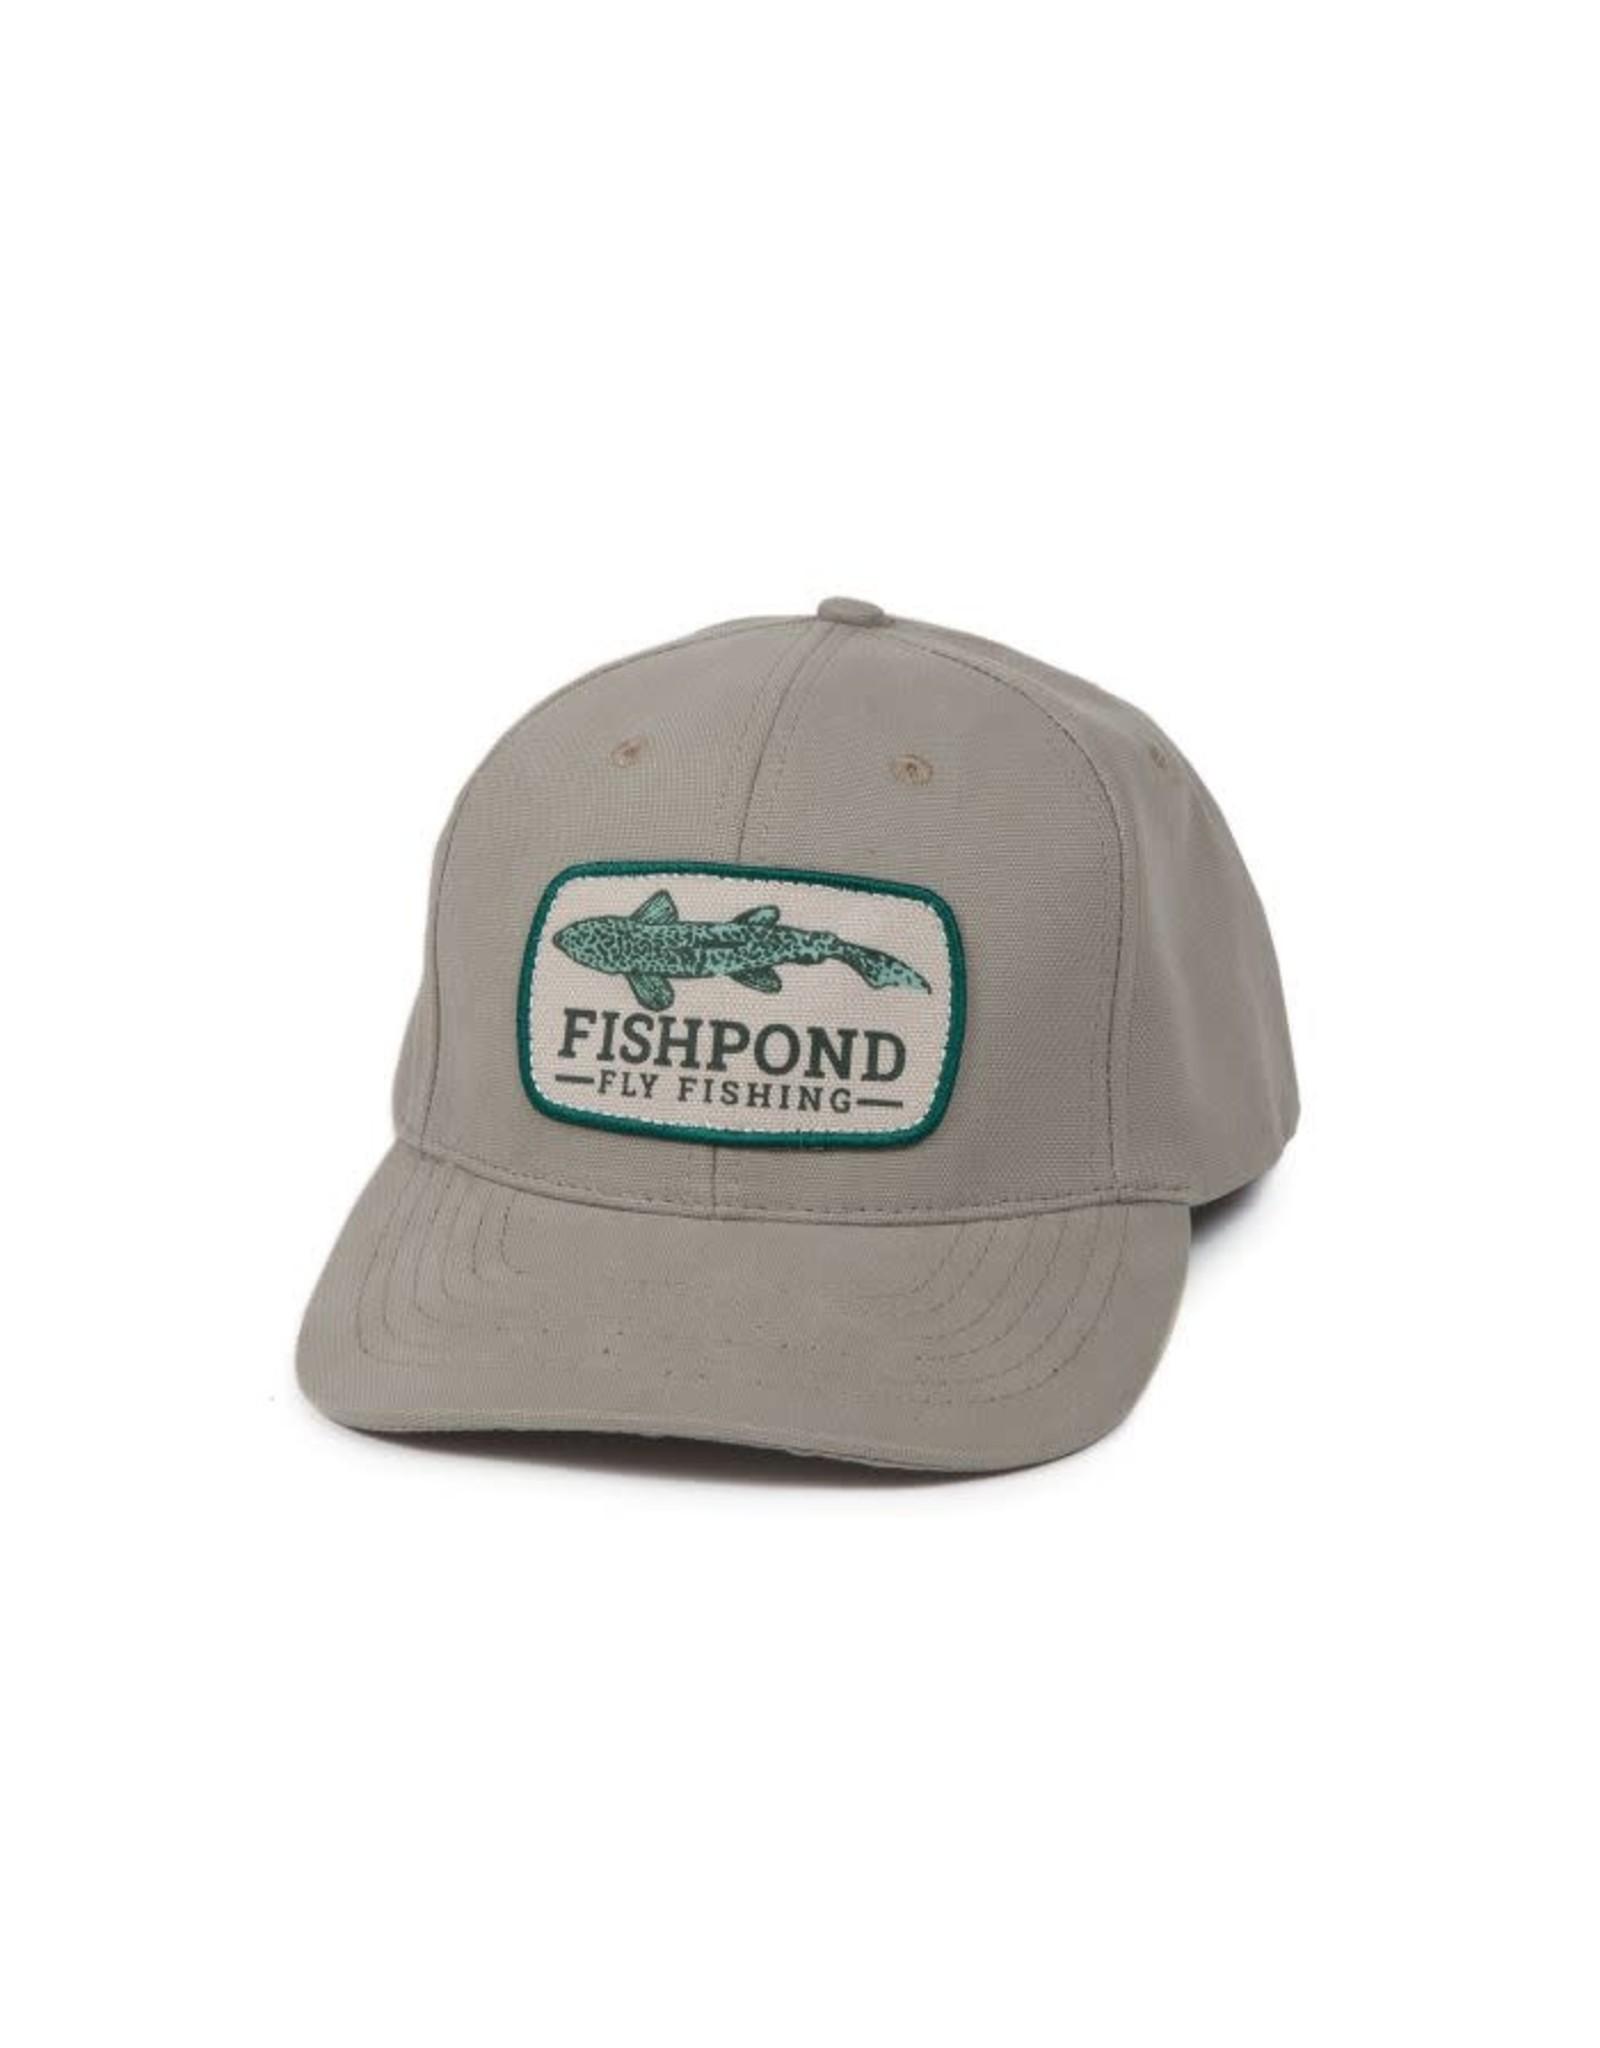 Fishpond Fishpond Trout Cruiser Hat